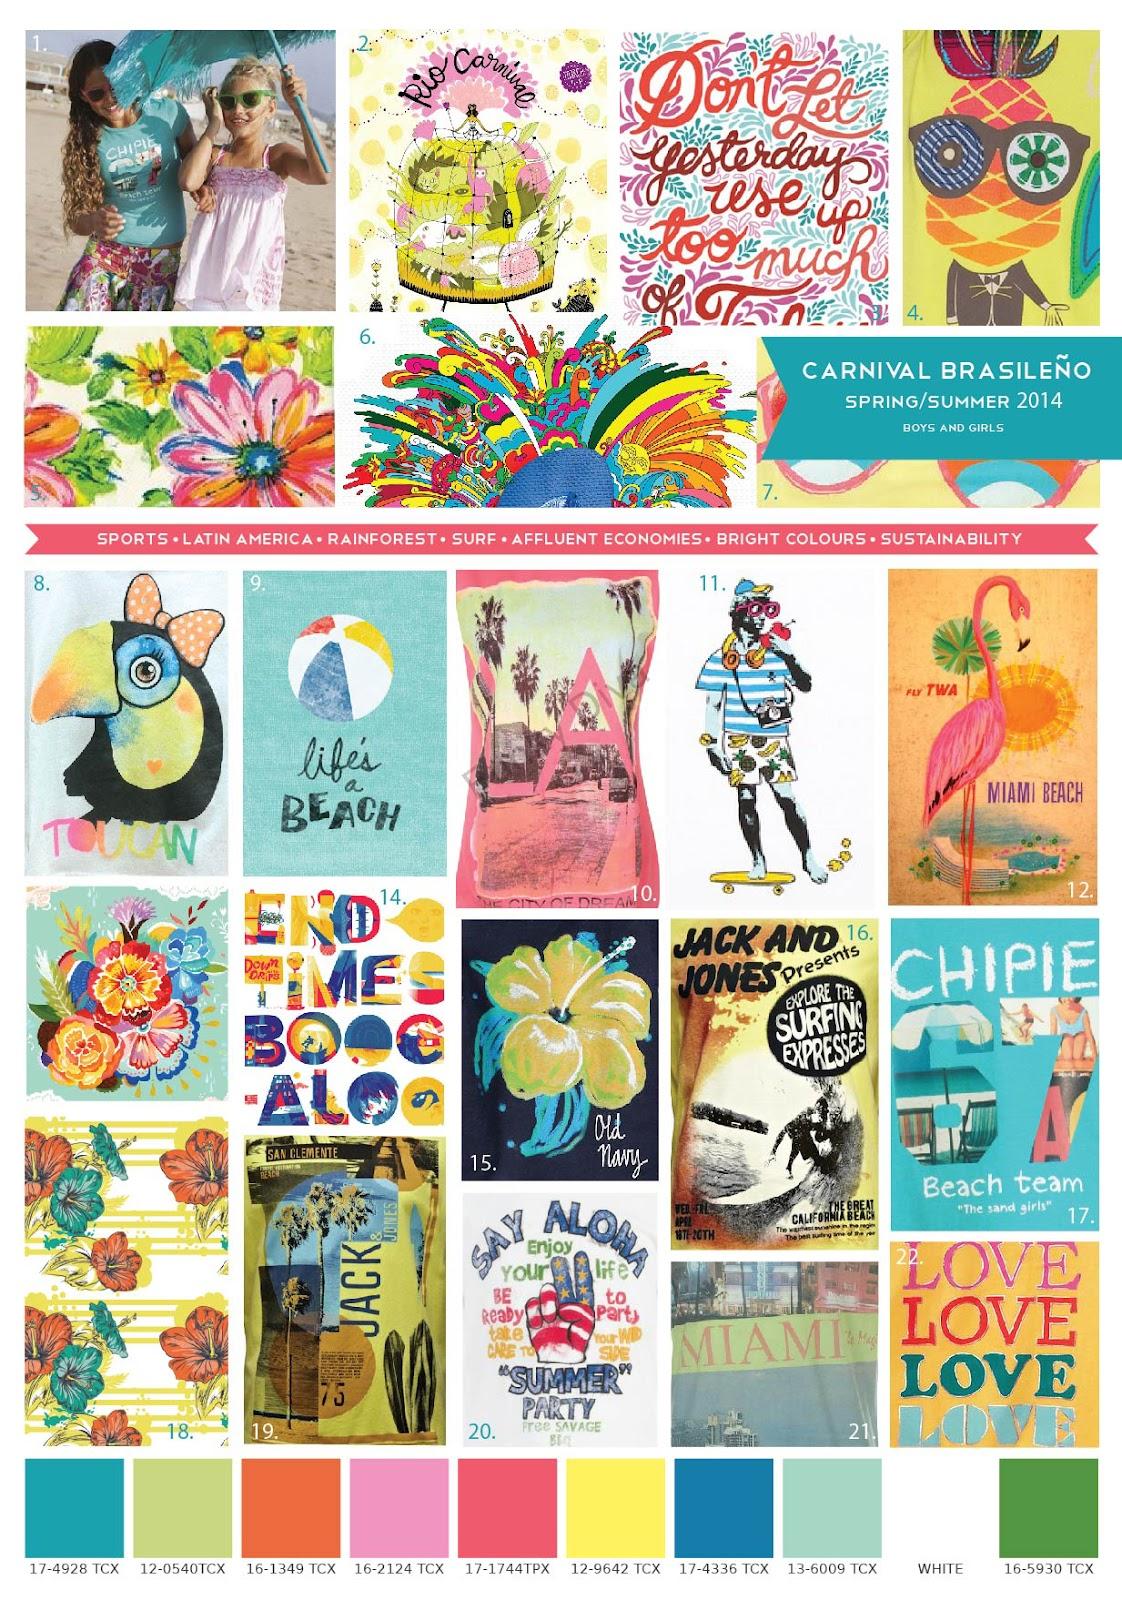 ... am introducing for Spring/Summer 2014 entitled 'Carnival Brasileno